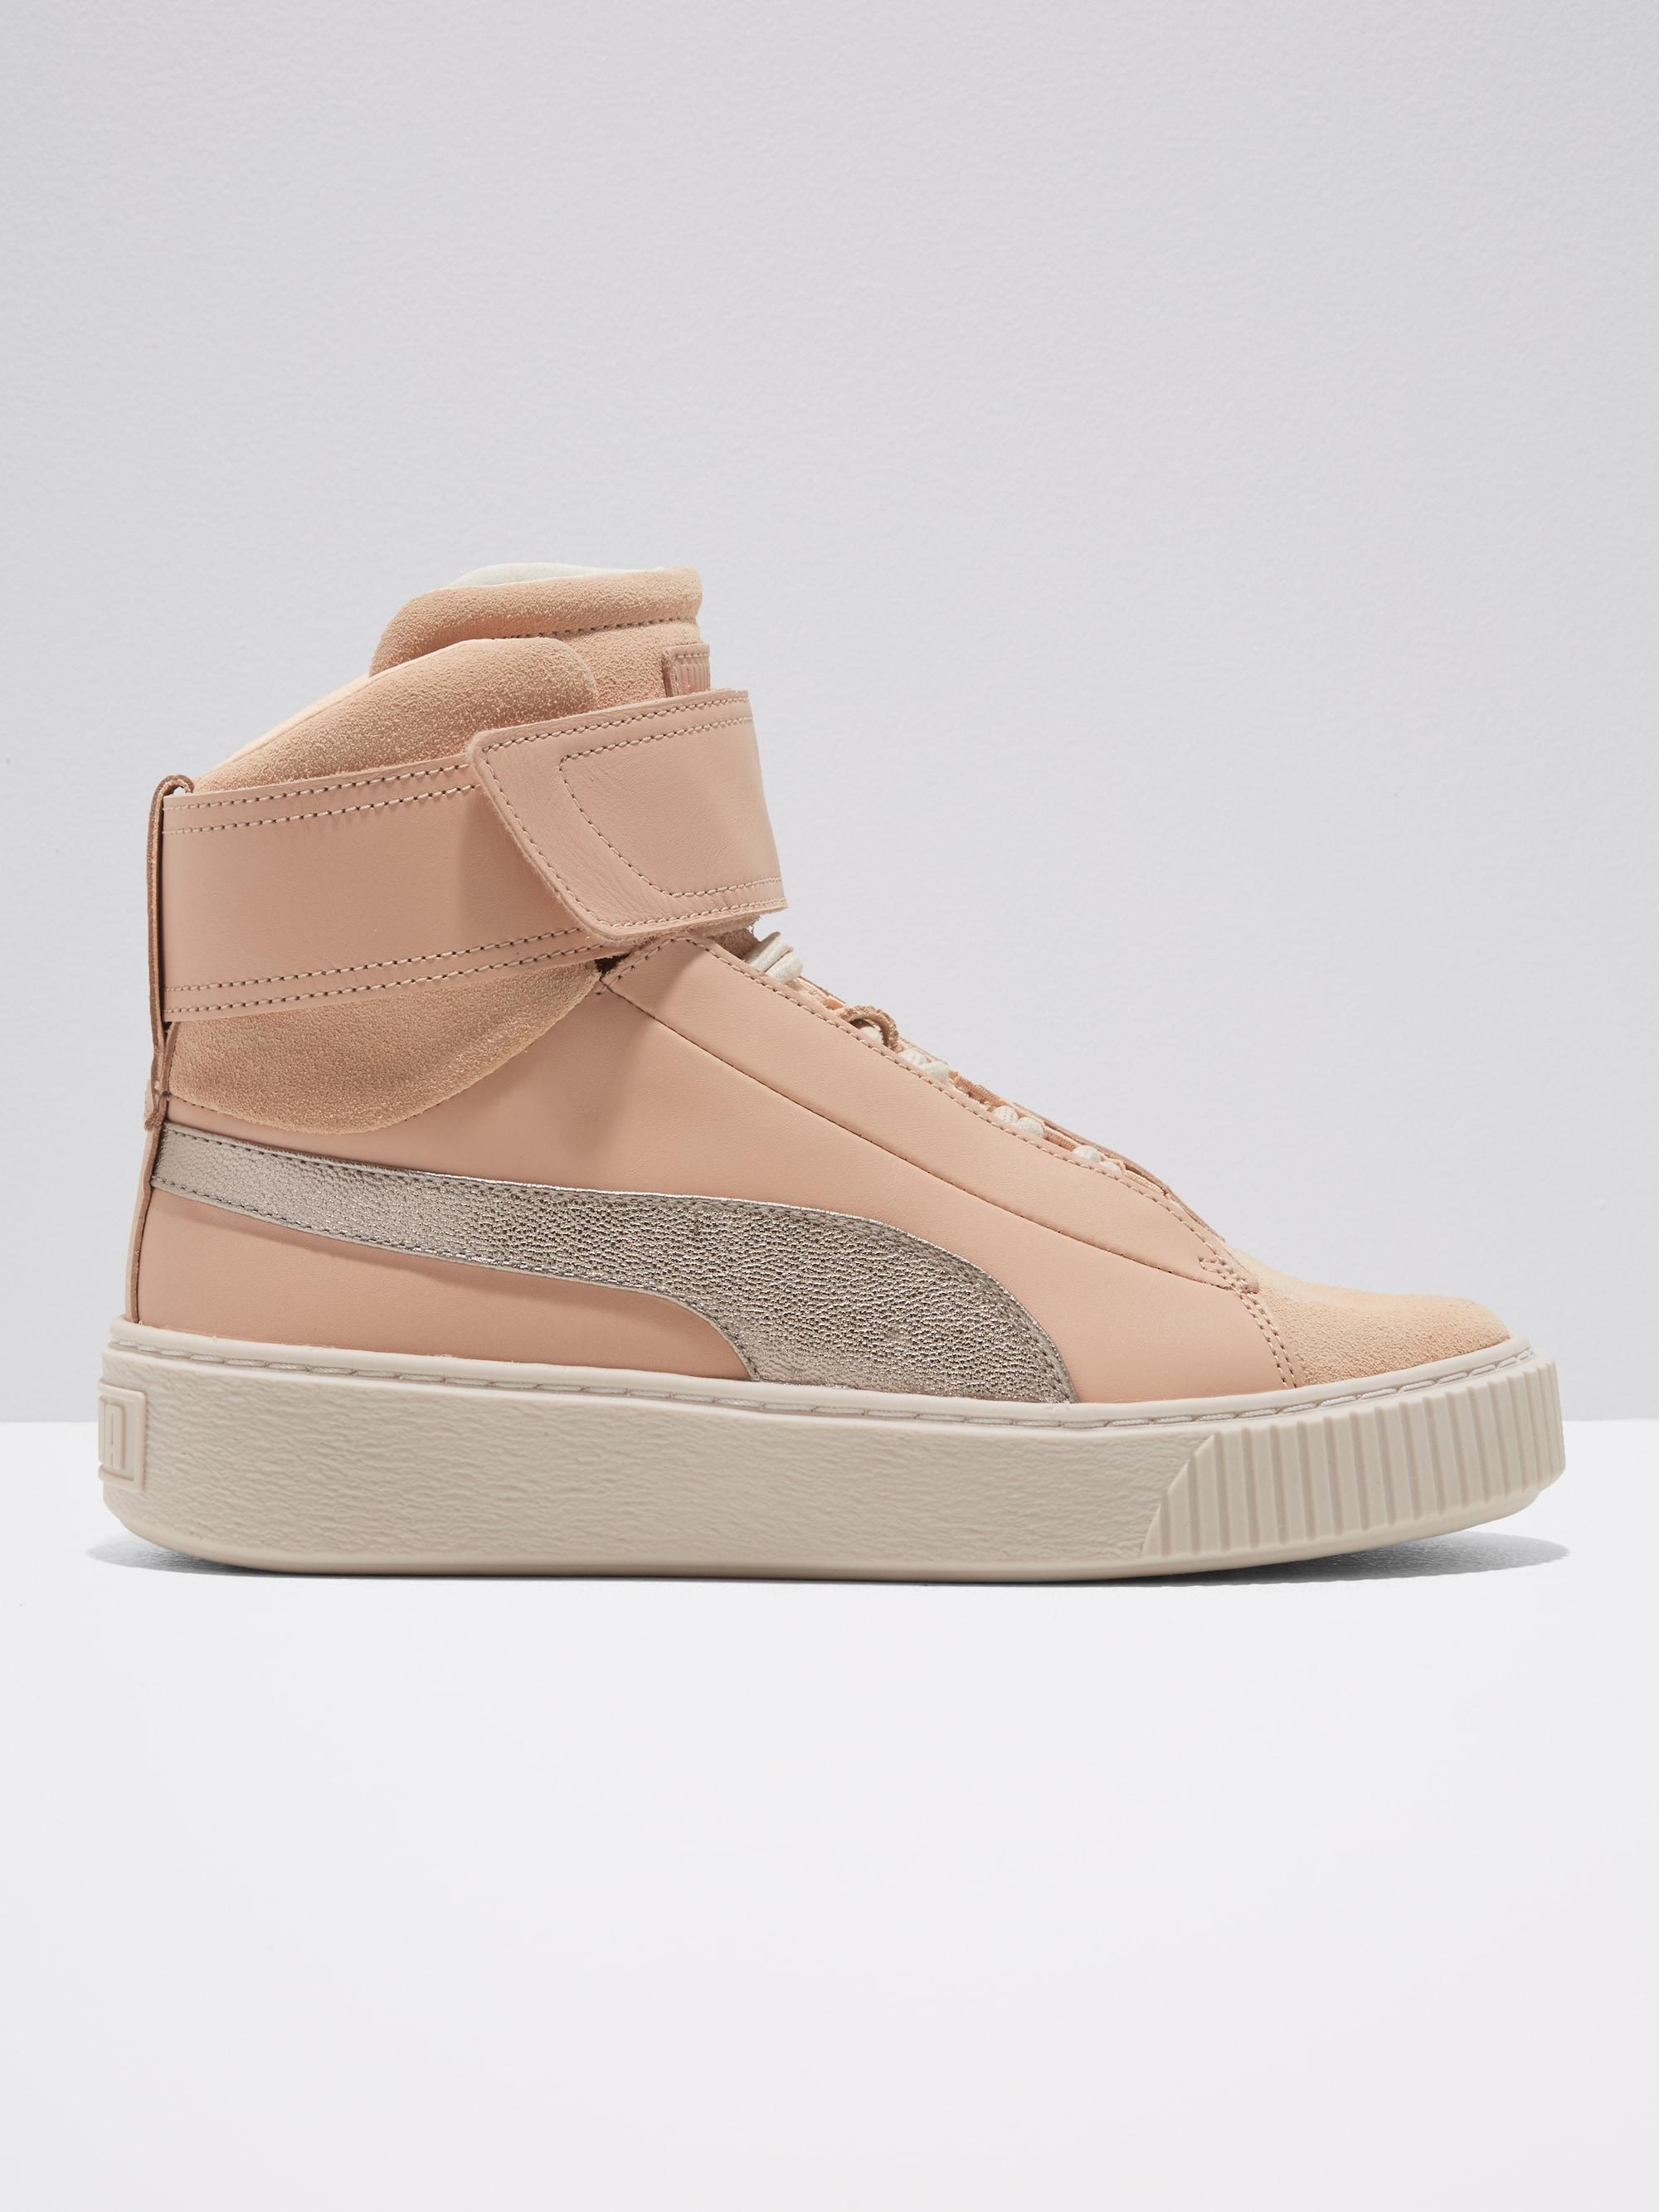 0f5dd63732b221 Lyst - Frank And Oak Puma Basket Platform Suede High-top Sneakers In ...